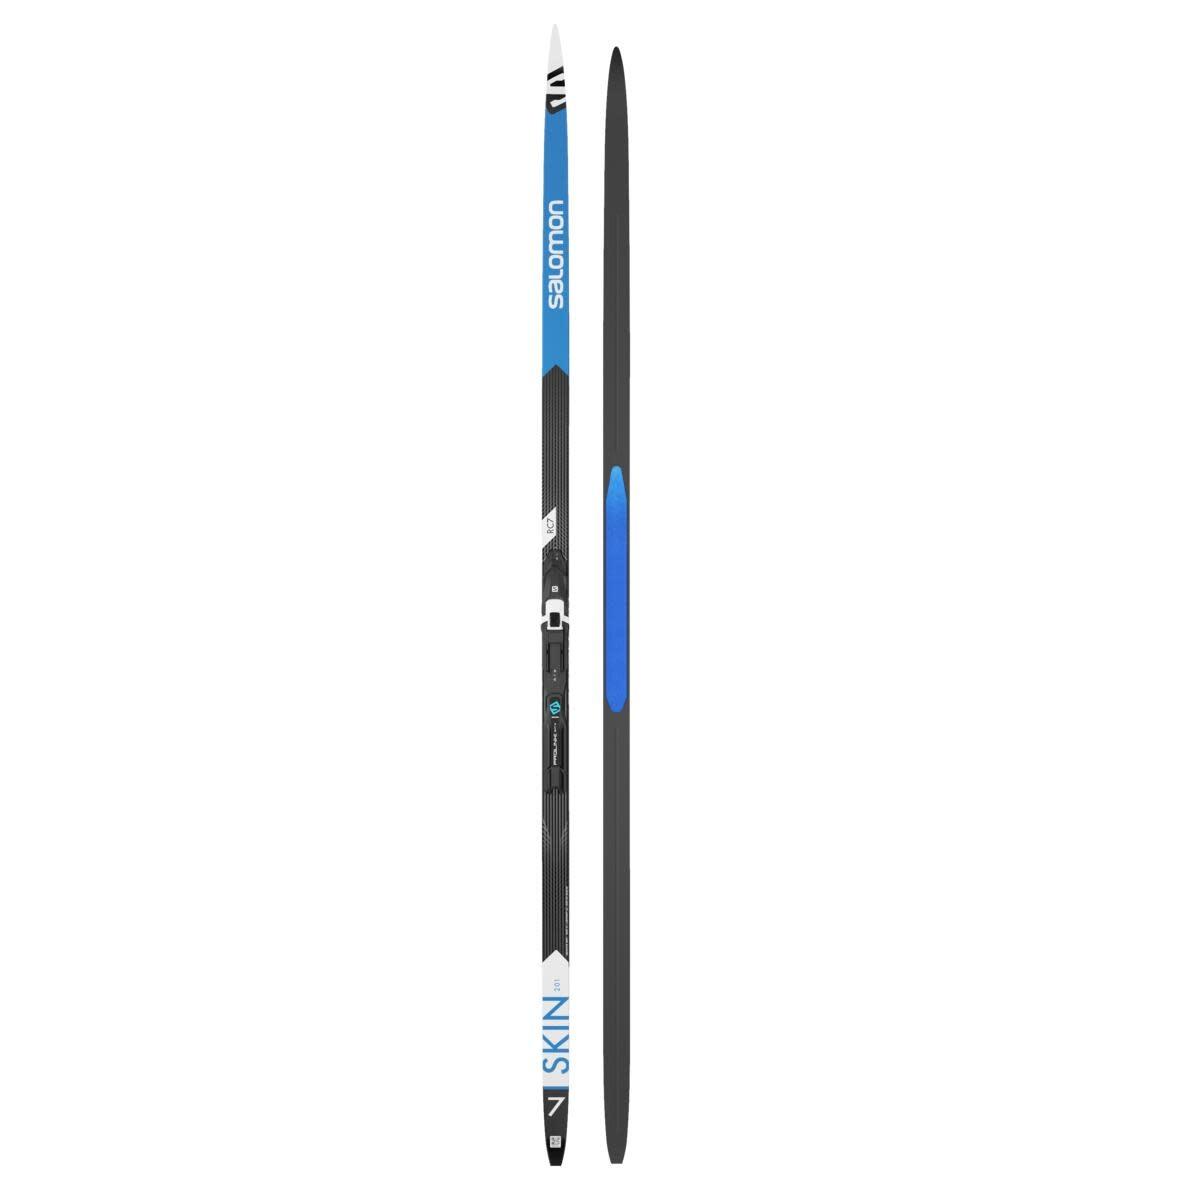 Skis Salomon RC7 eSkin Hard+ Plk shift pro